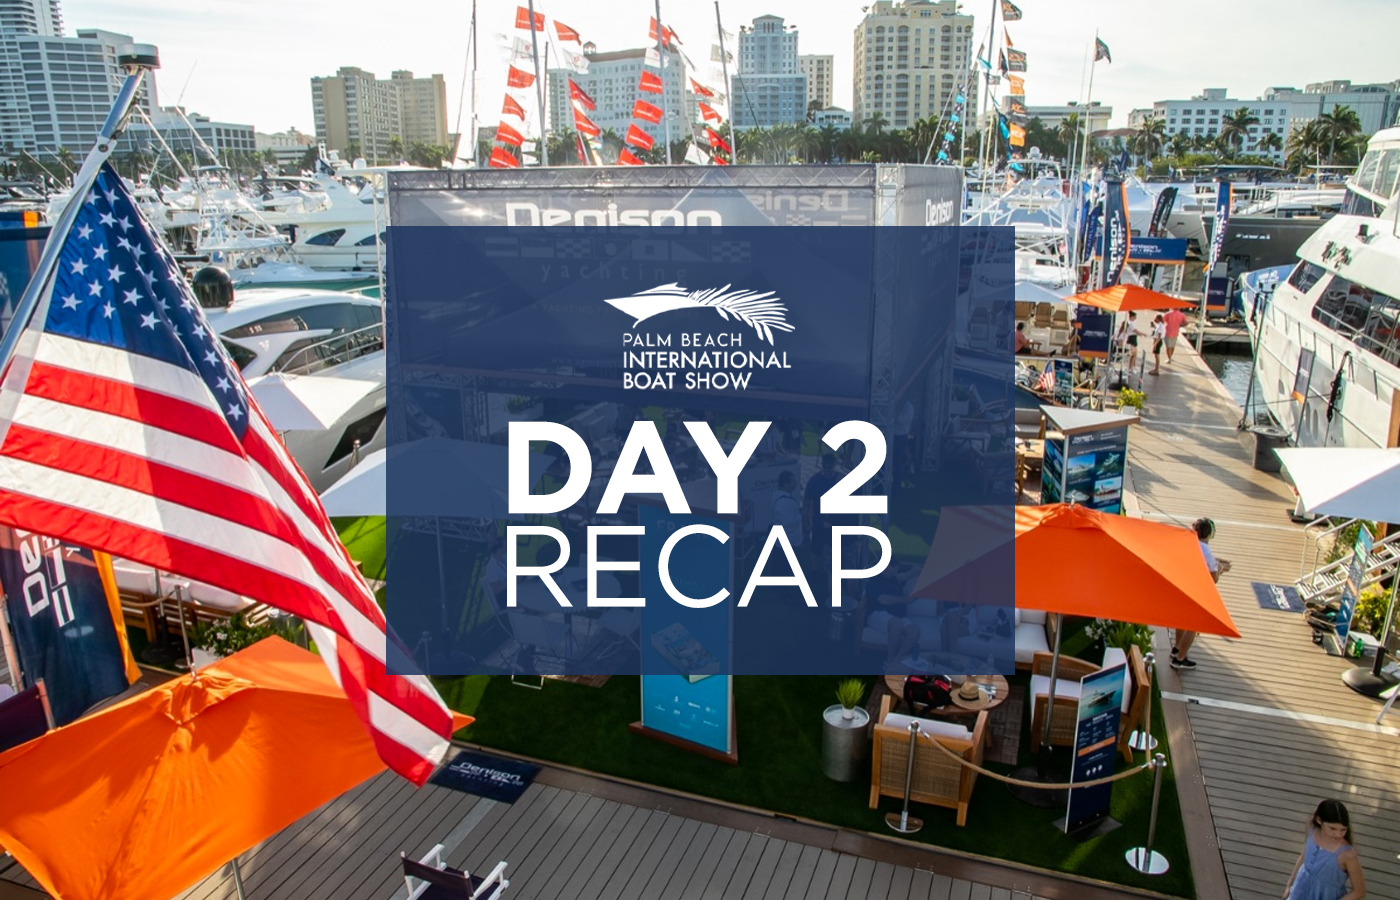 Palm Beach Boat Show 2021 Day 2 Recap